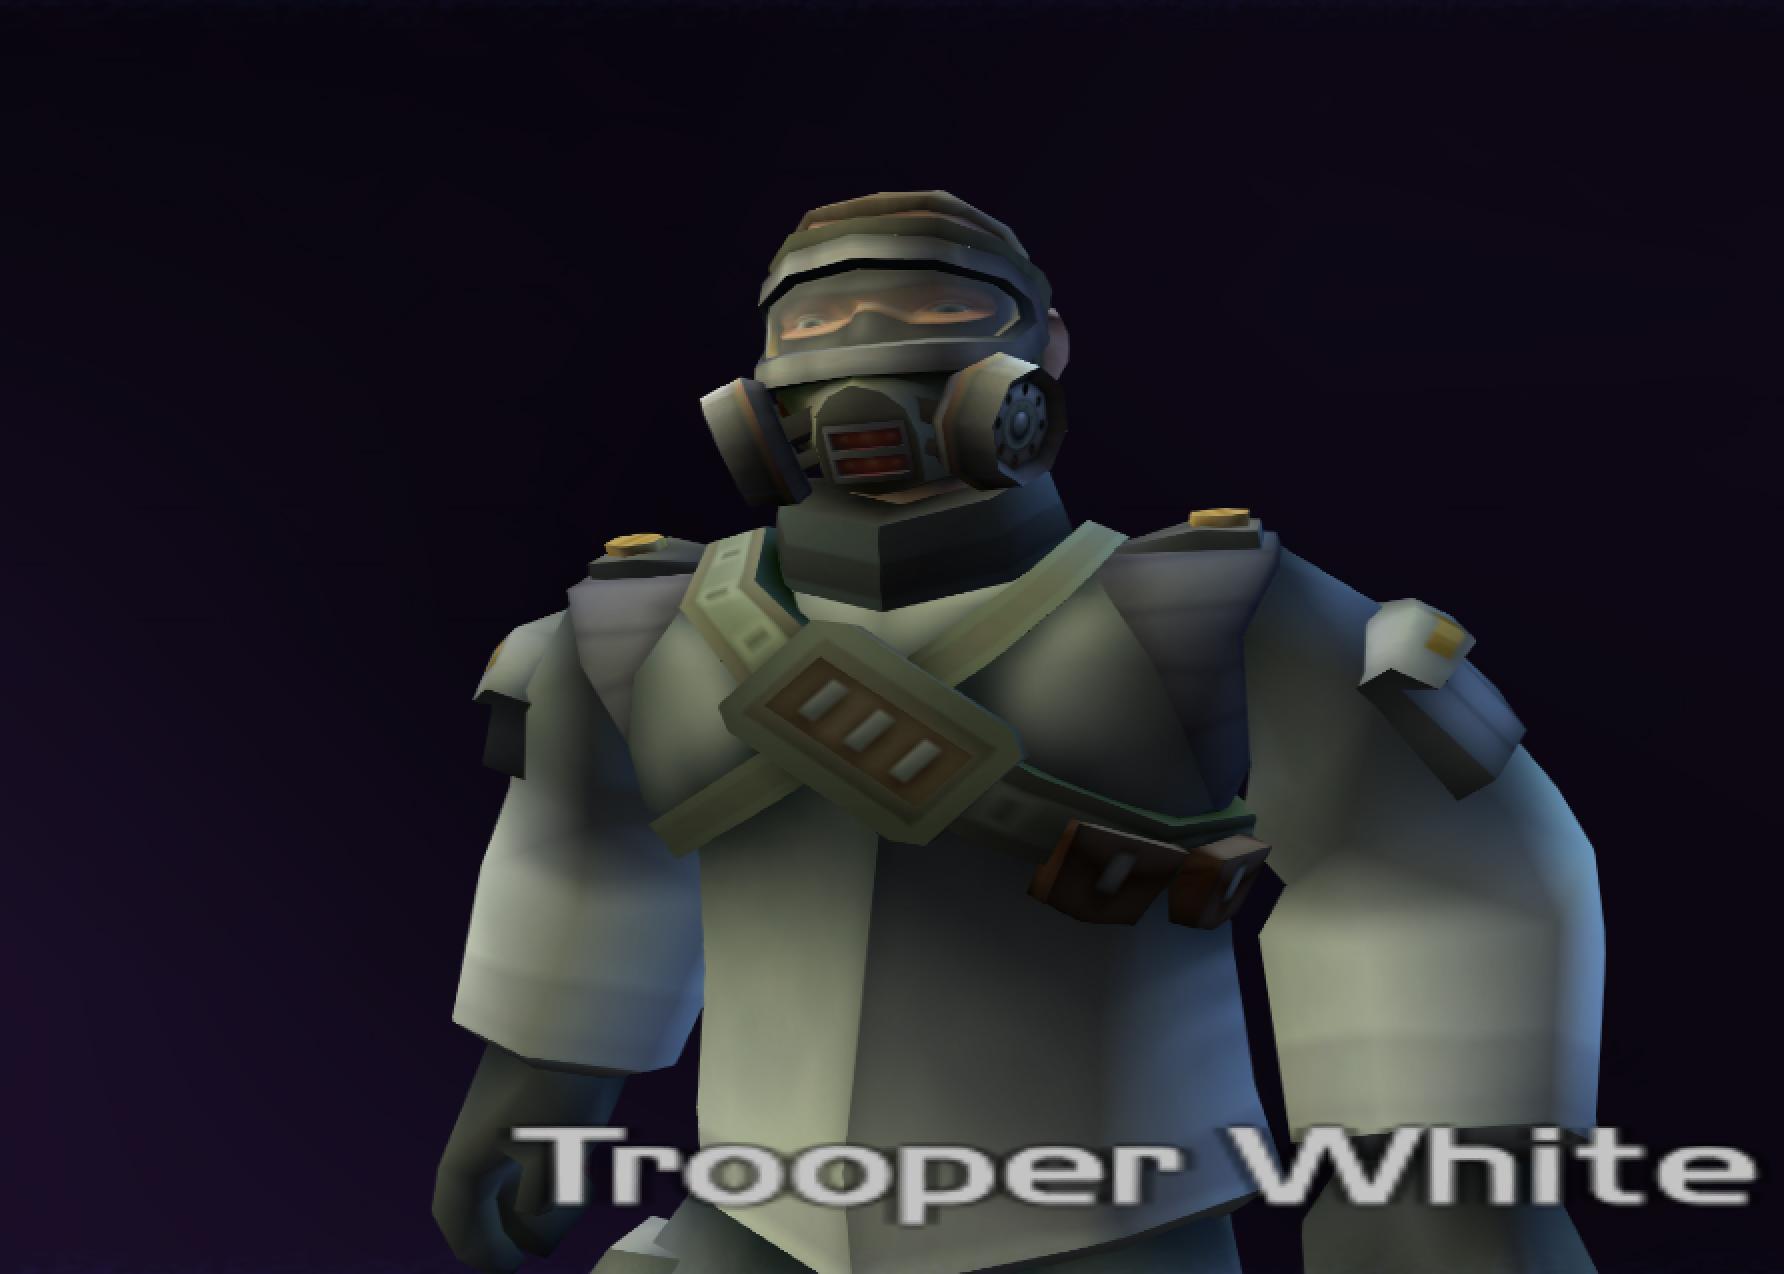 Trooper White